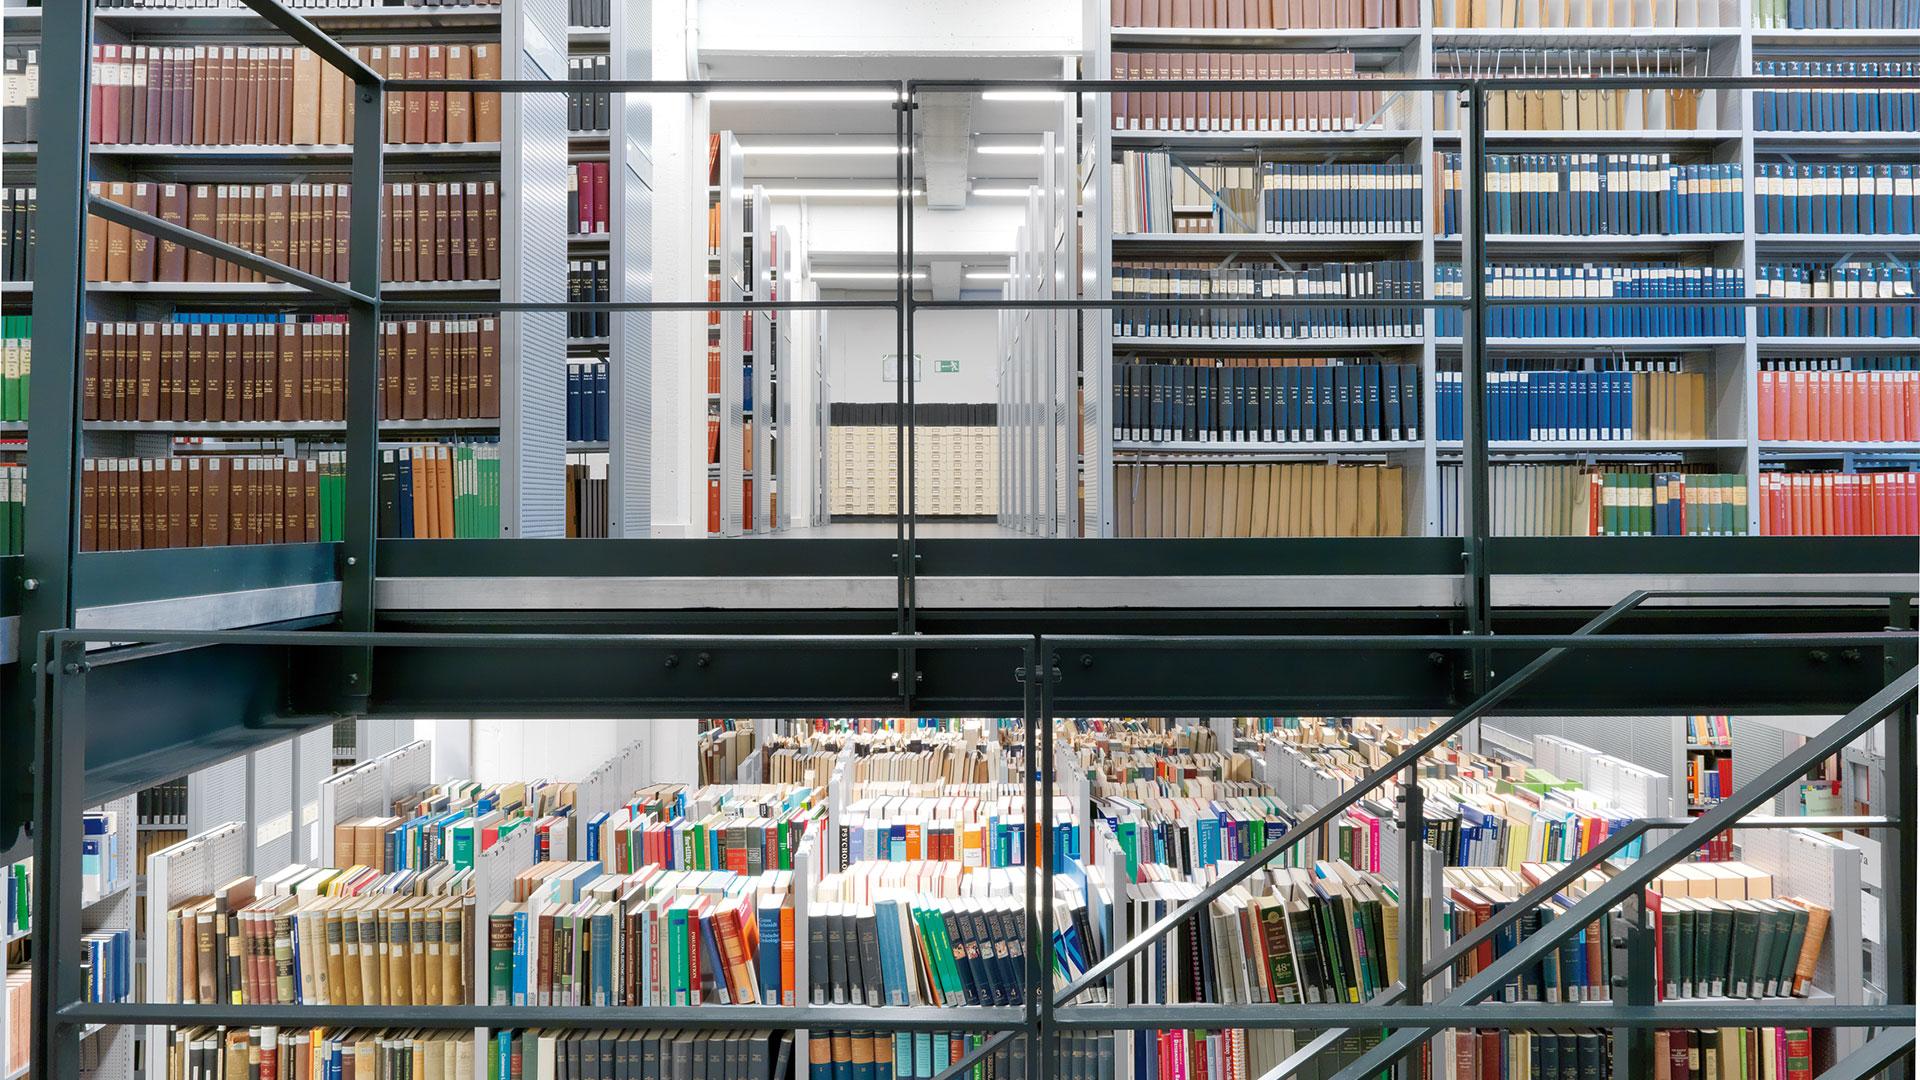 Regalsysteme-Archivregal-Rollregal-Buecher-doppelstoeckig-RR409-mauser-16-9